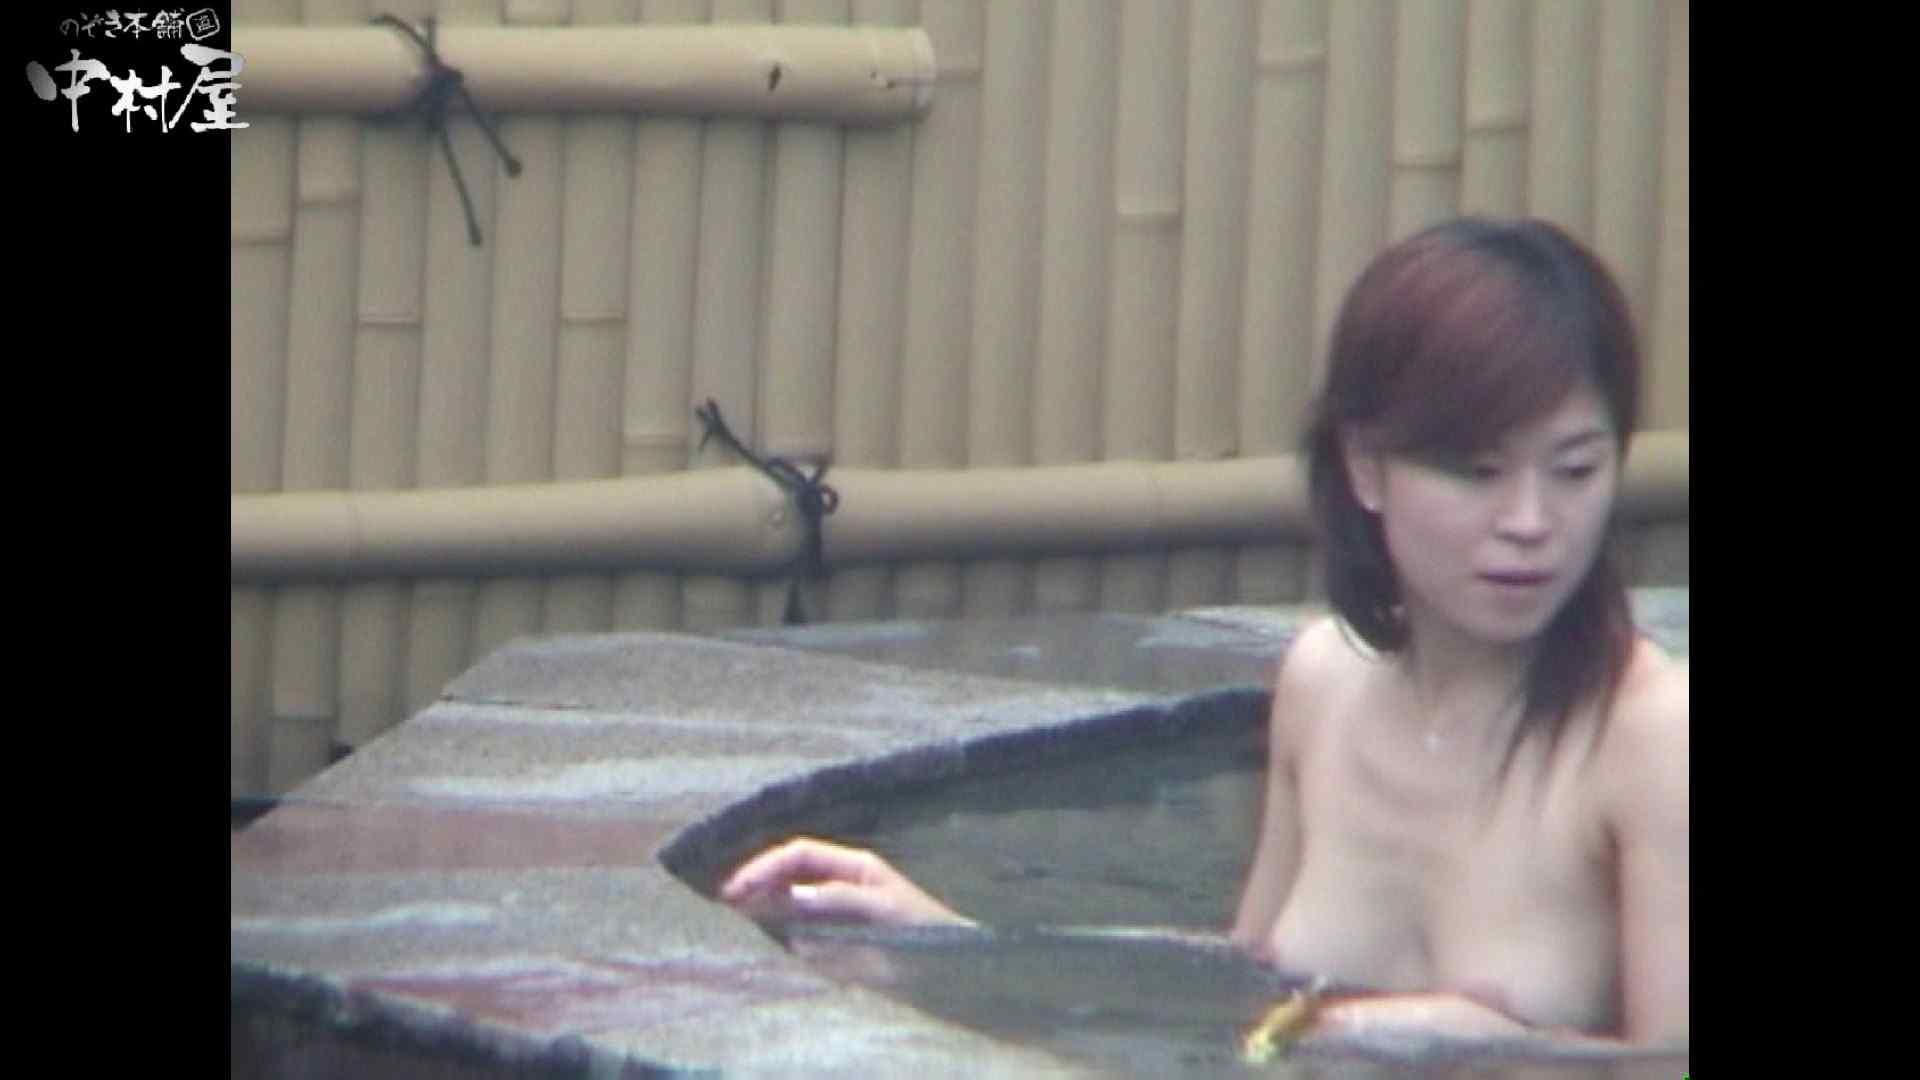 Aquaな露天風呂Vol.962 盗撮師作品   露天風呂突入  74pic 16